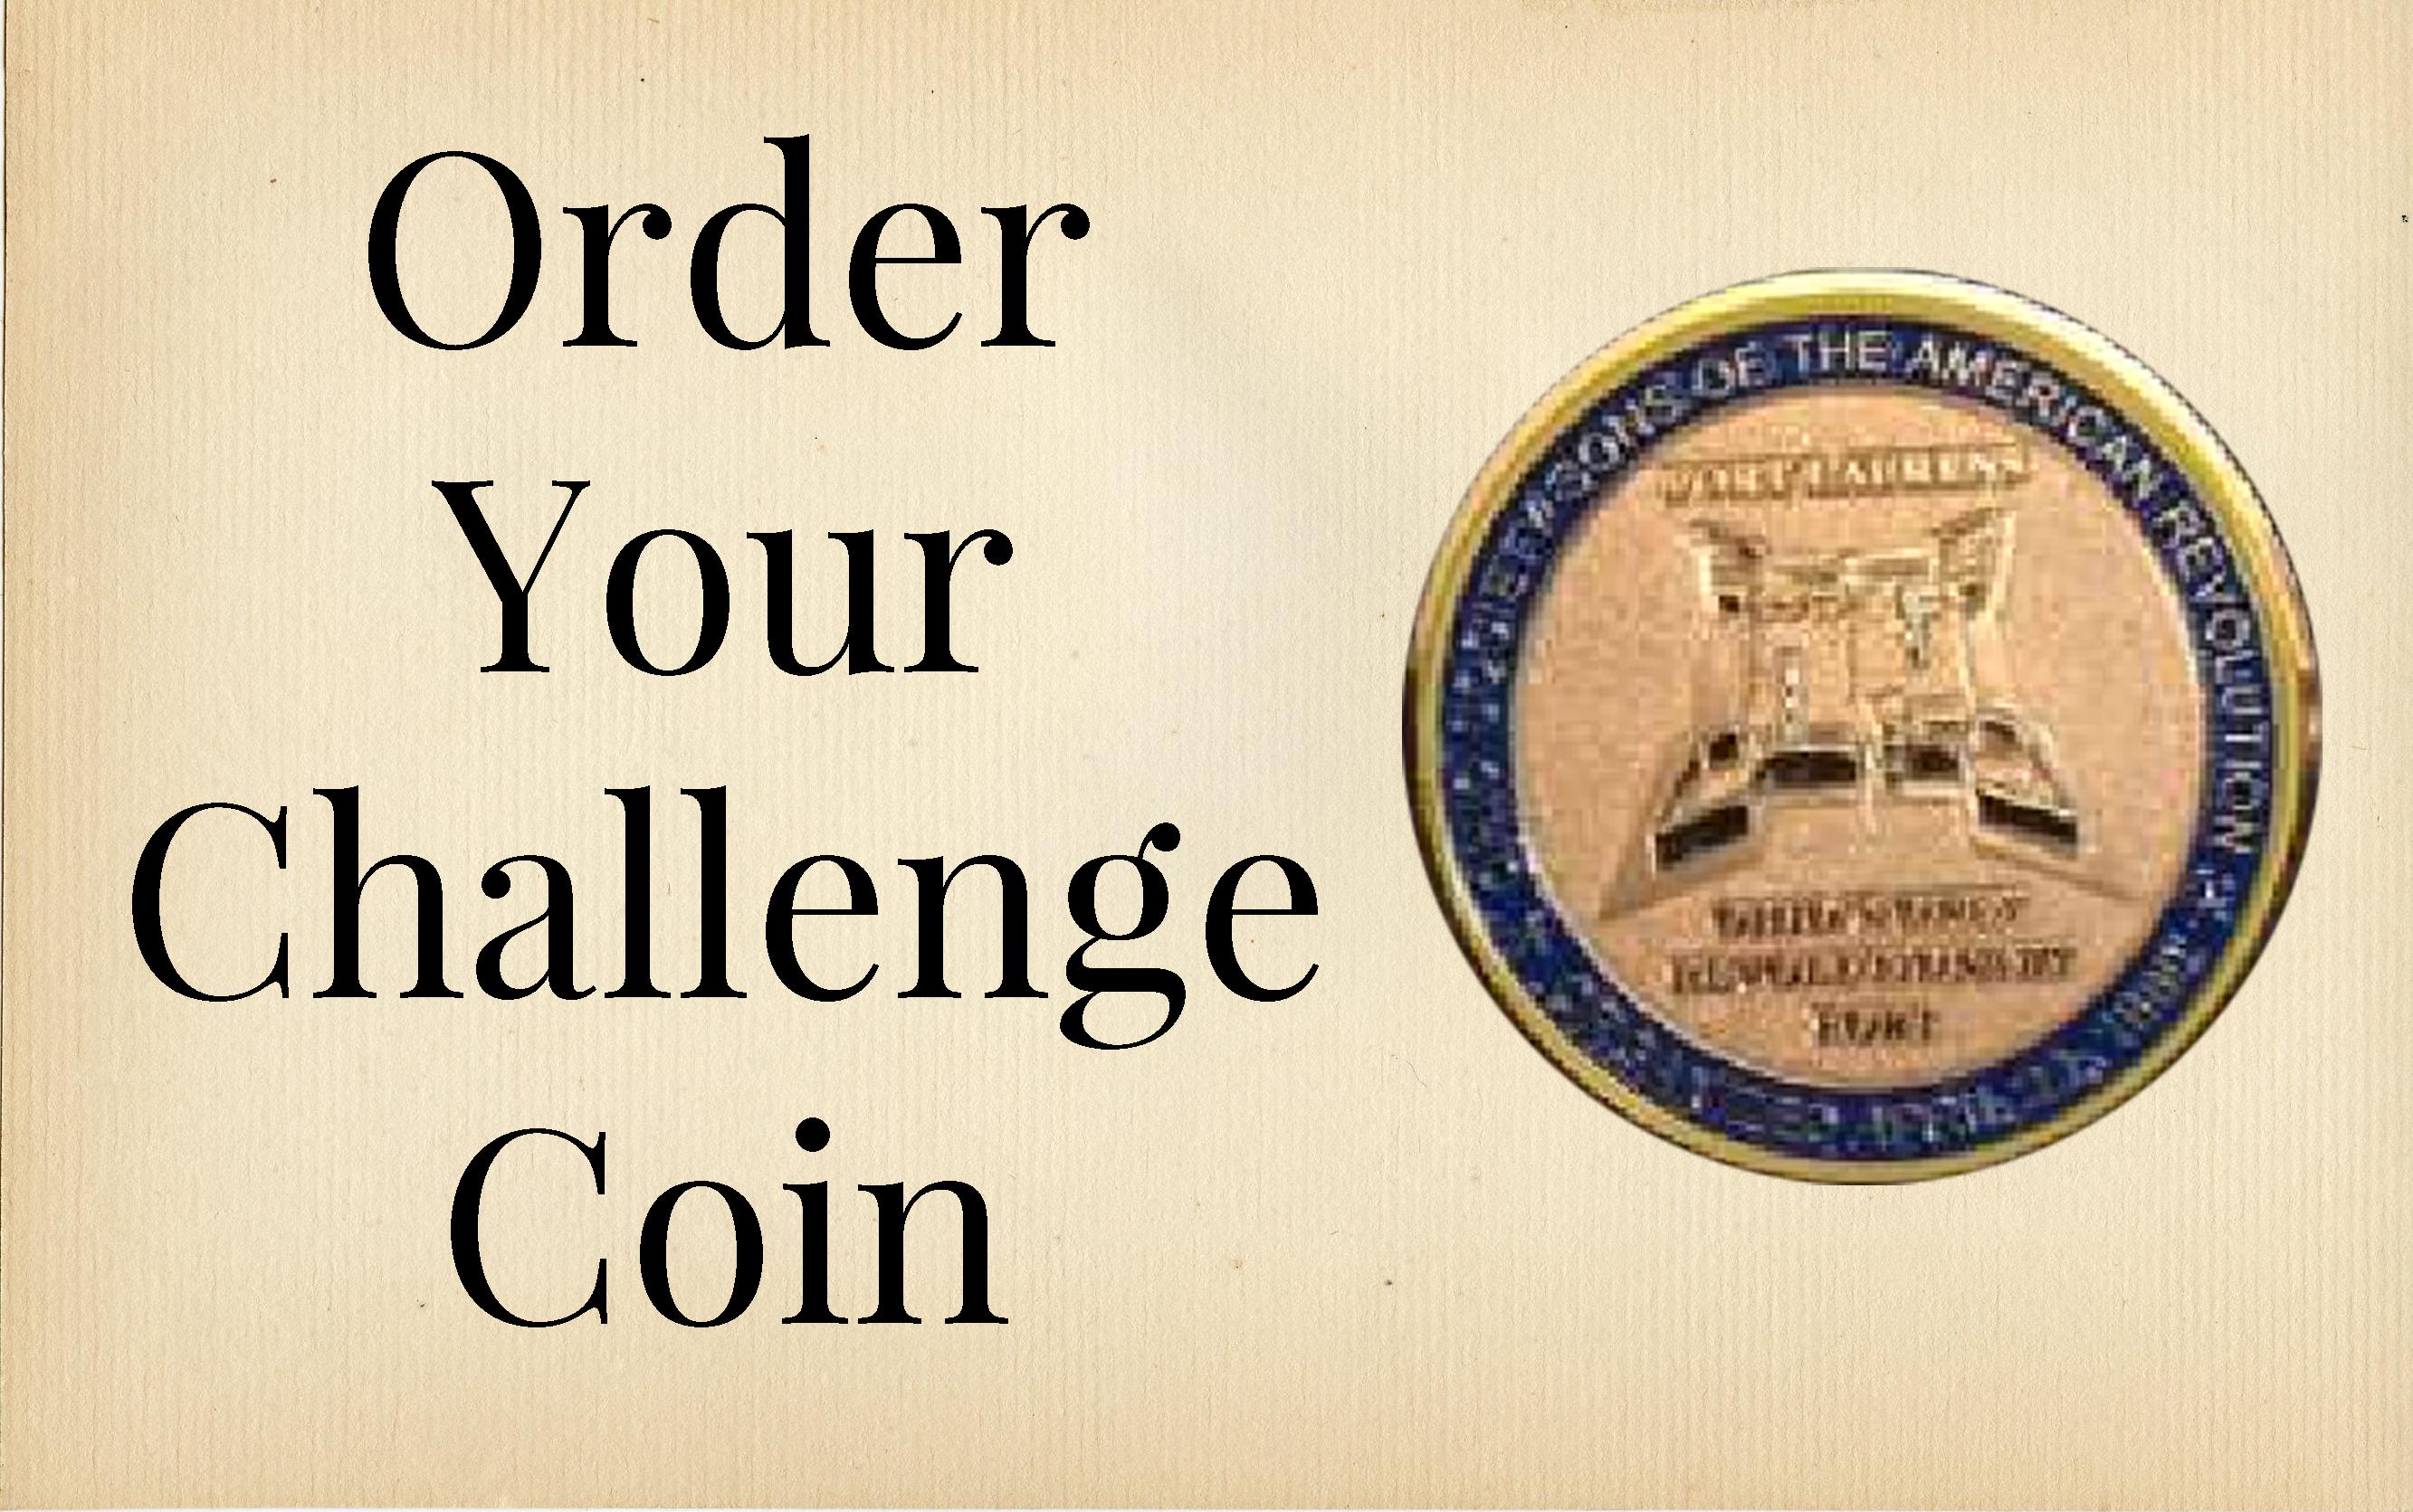 ChallengeCoin.jpg